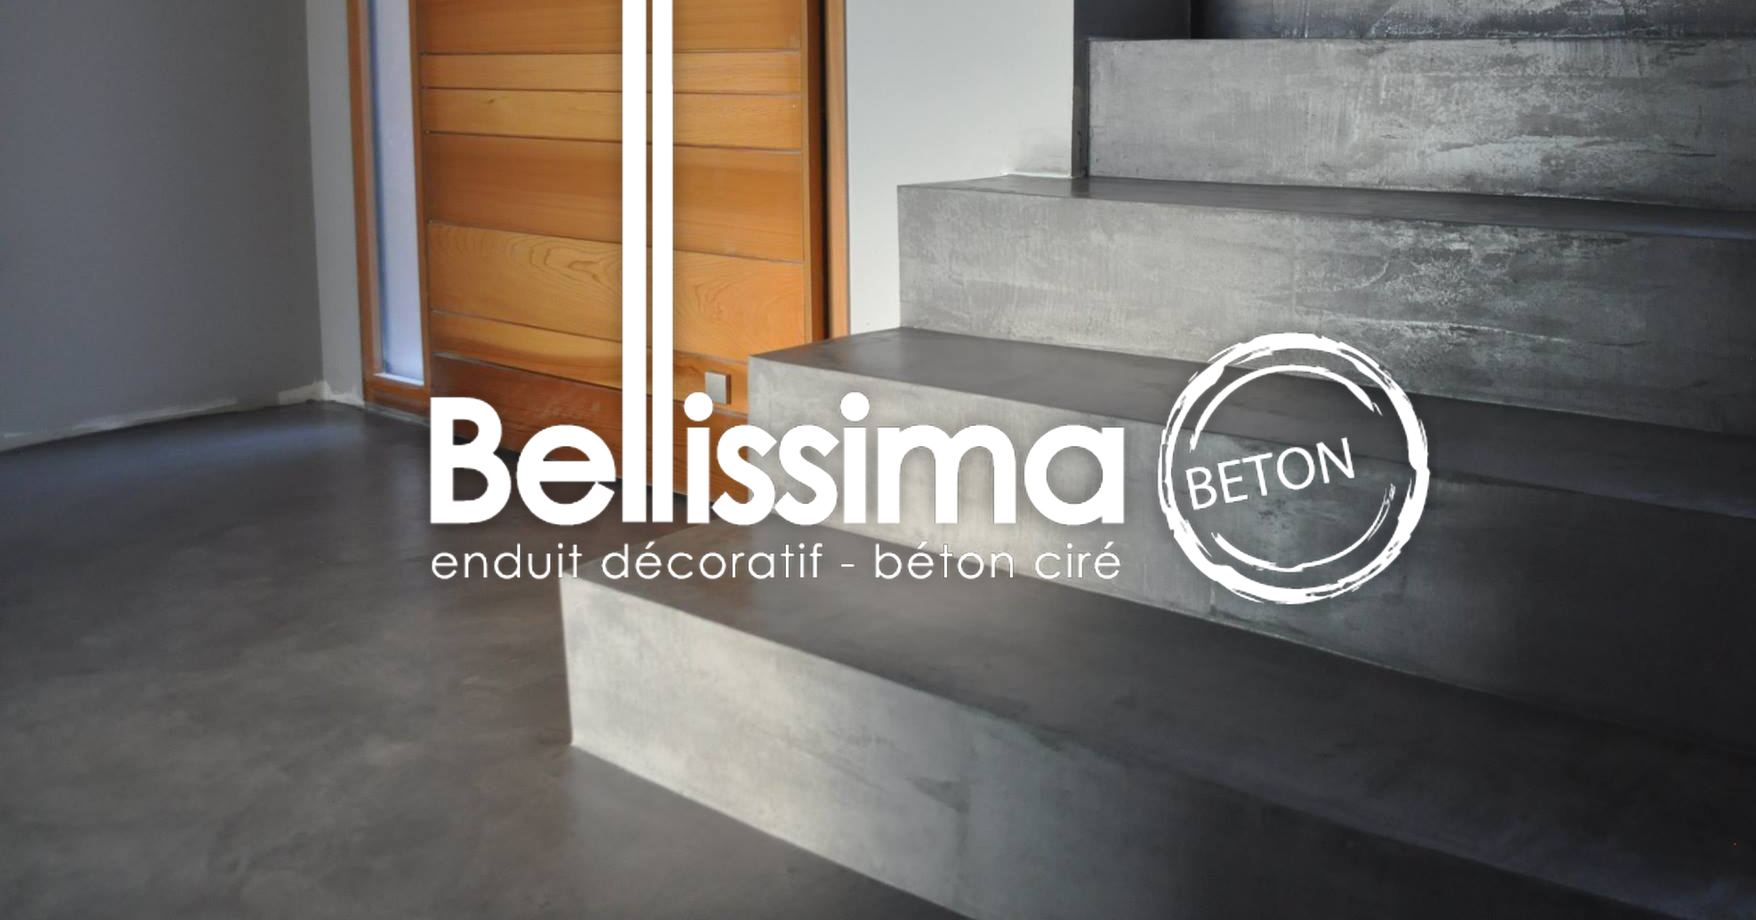 Bellissima Beton Enduit Decoratif Beton Cire Toulouse